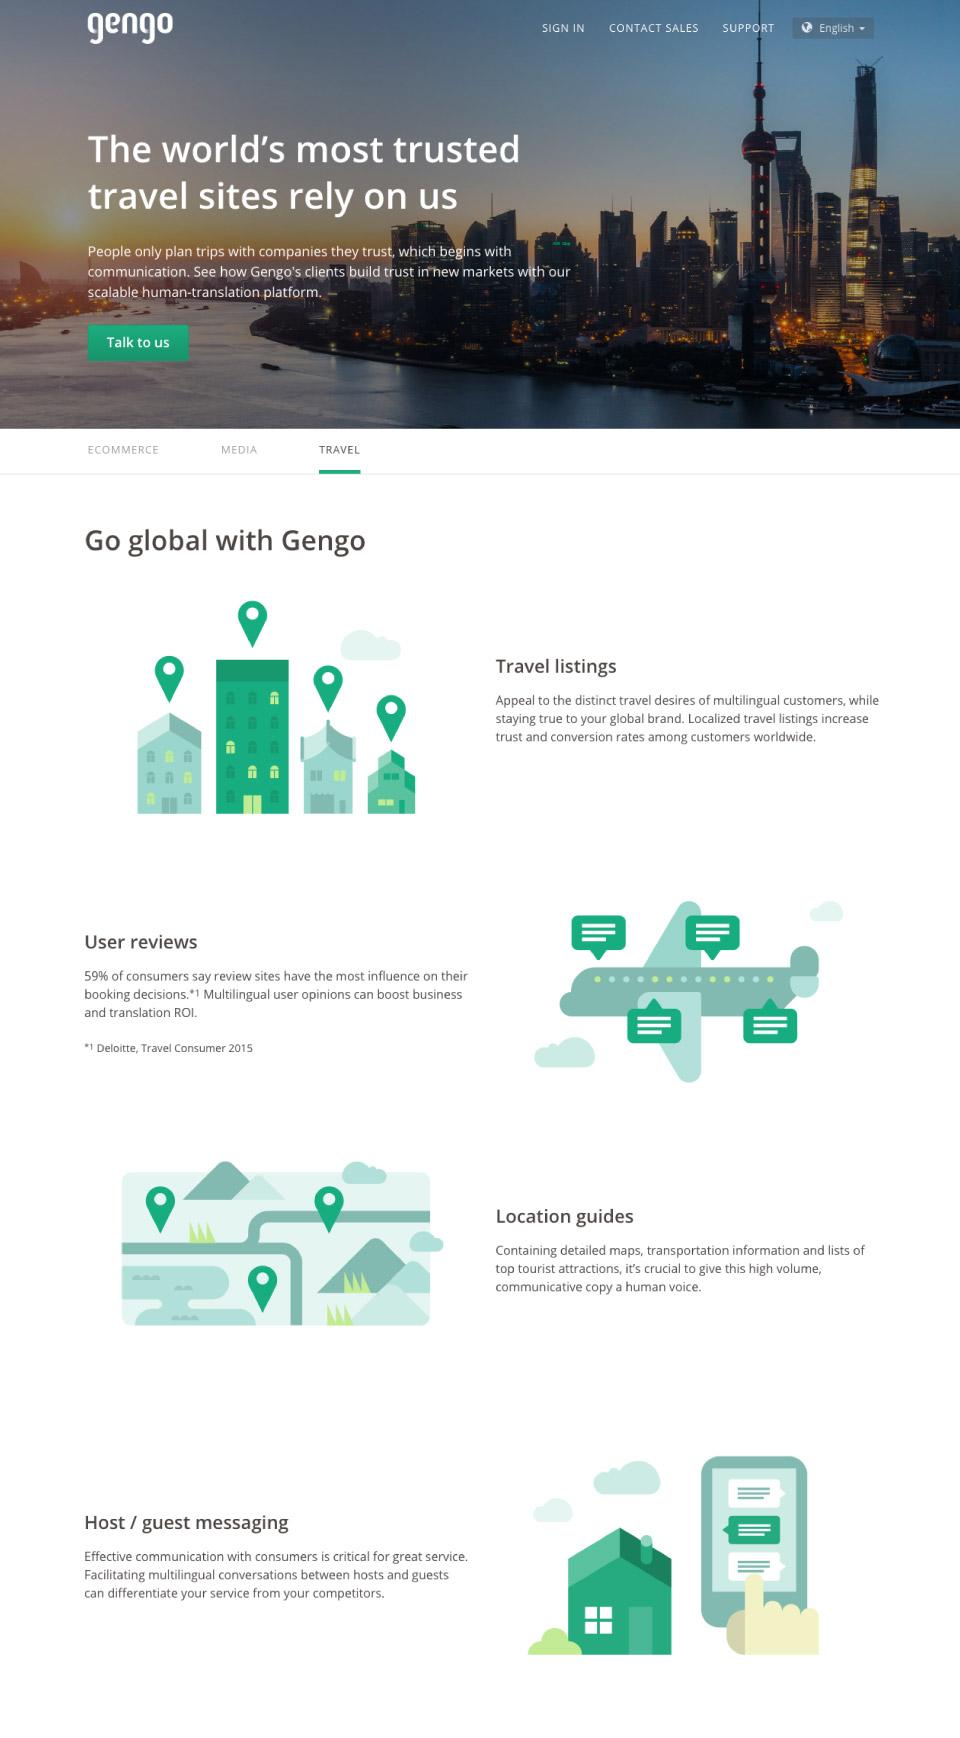 gengo japan human translation service - website icon spot illustrations